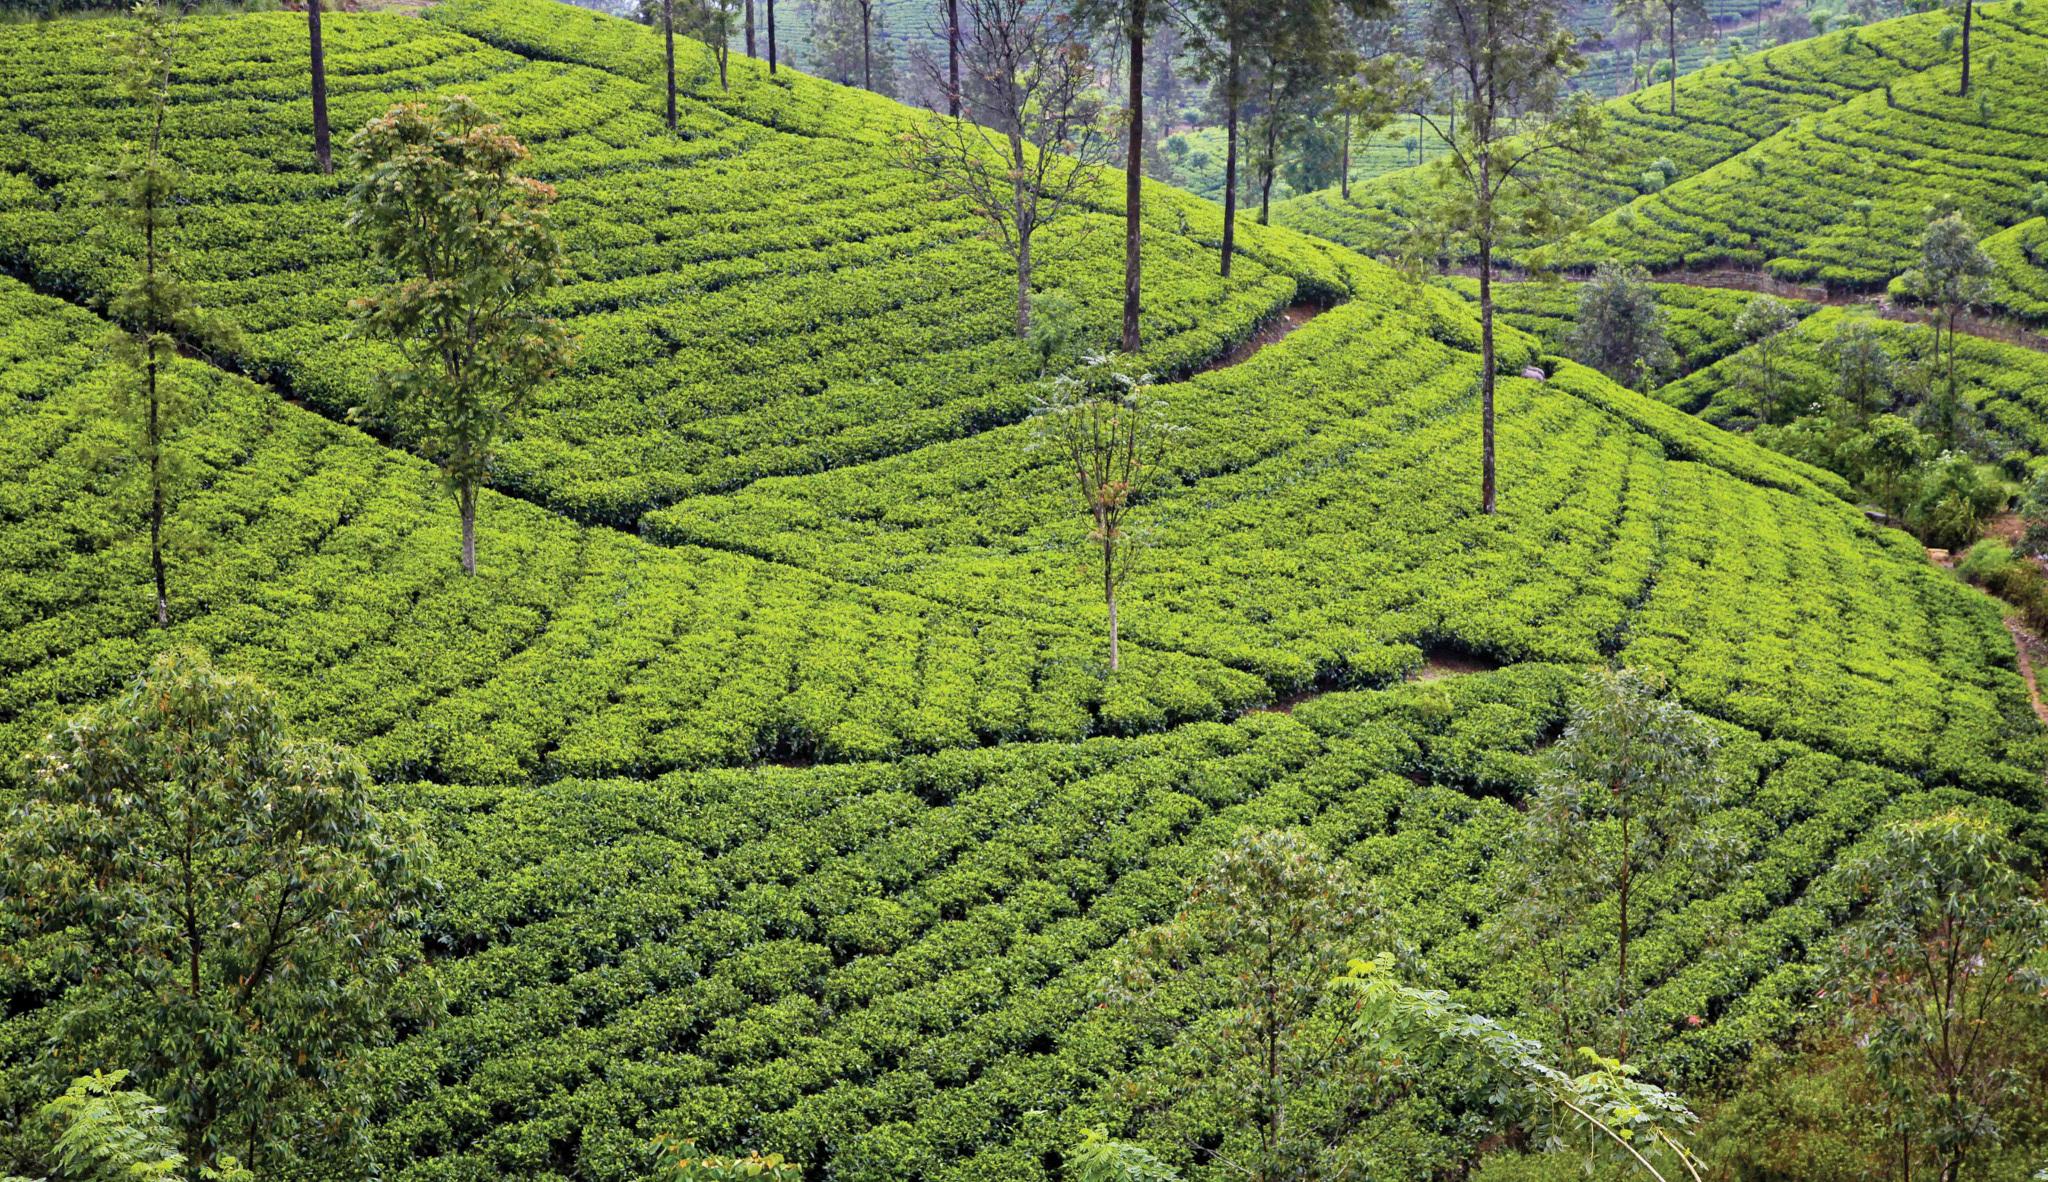 Trekking in Nuwara Eliya Tea Trails